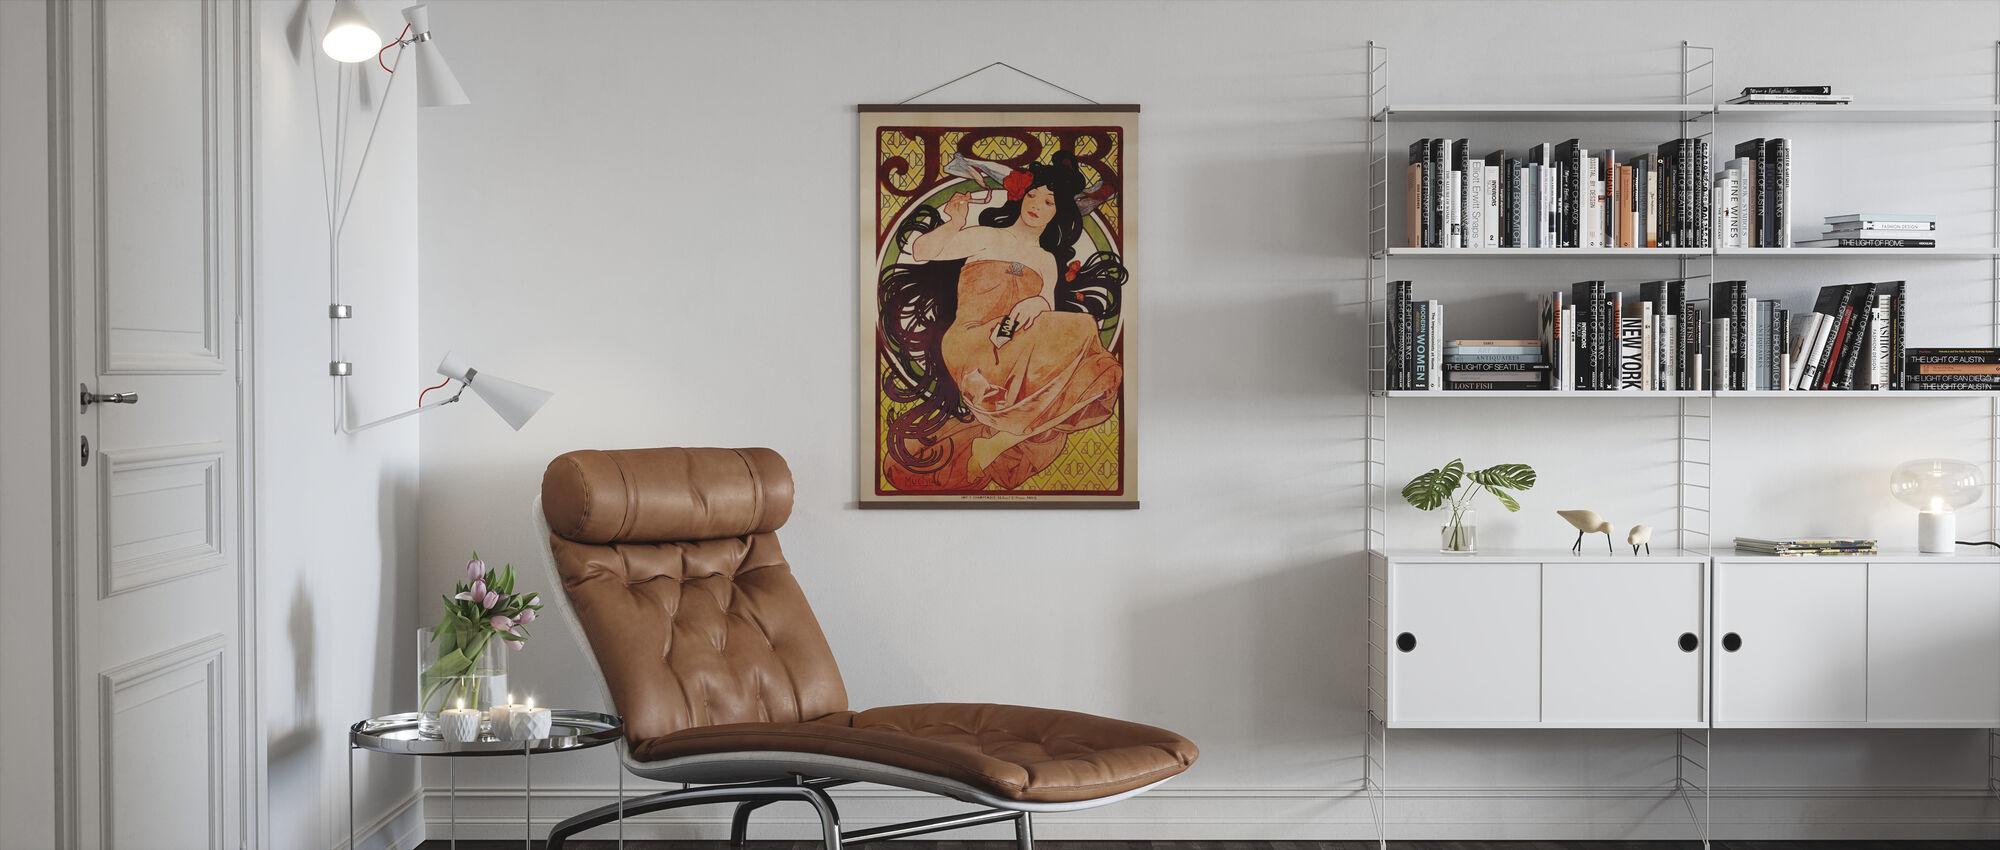 Alphonse Mucha - Jobb färg litho - Poster - Vardagsrum